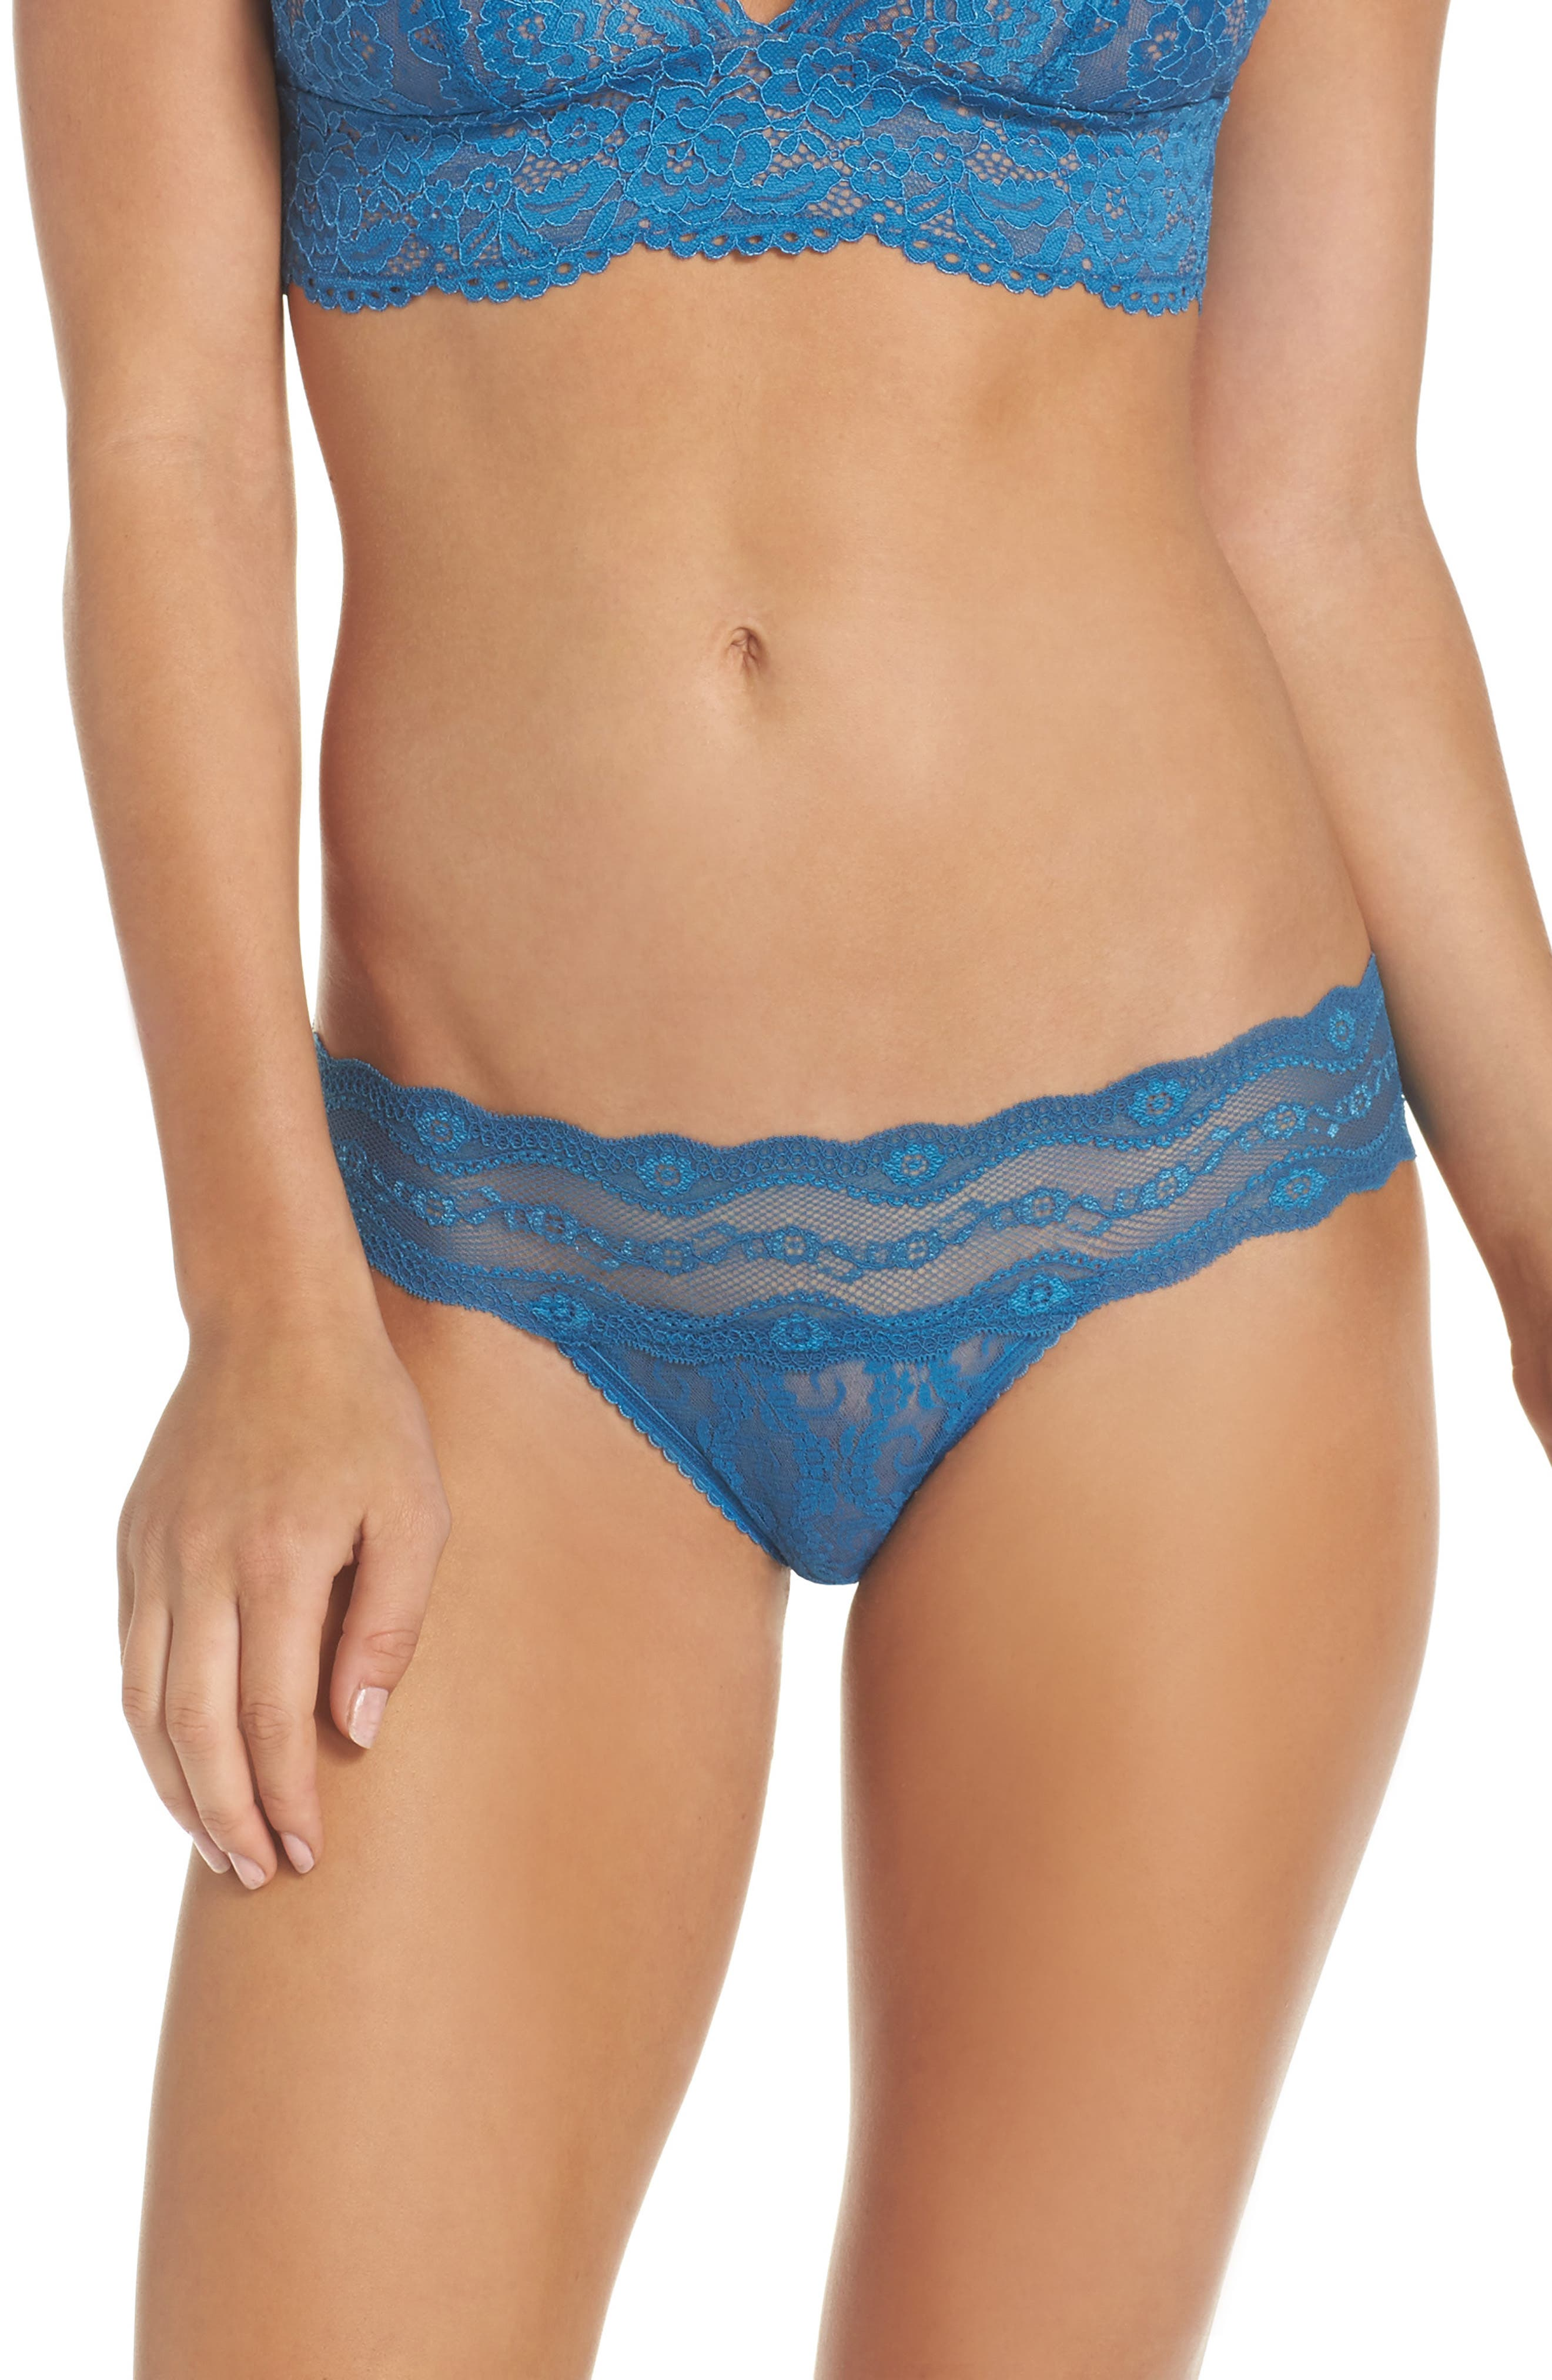 b.tempt'd by Wacoal 'Lace Kiss' Bikini (3 for $33)